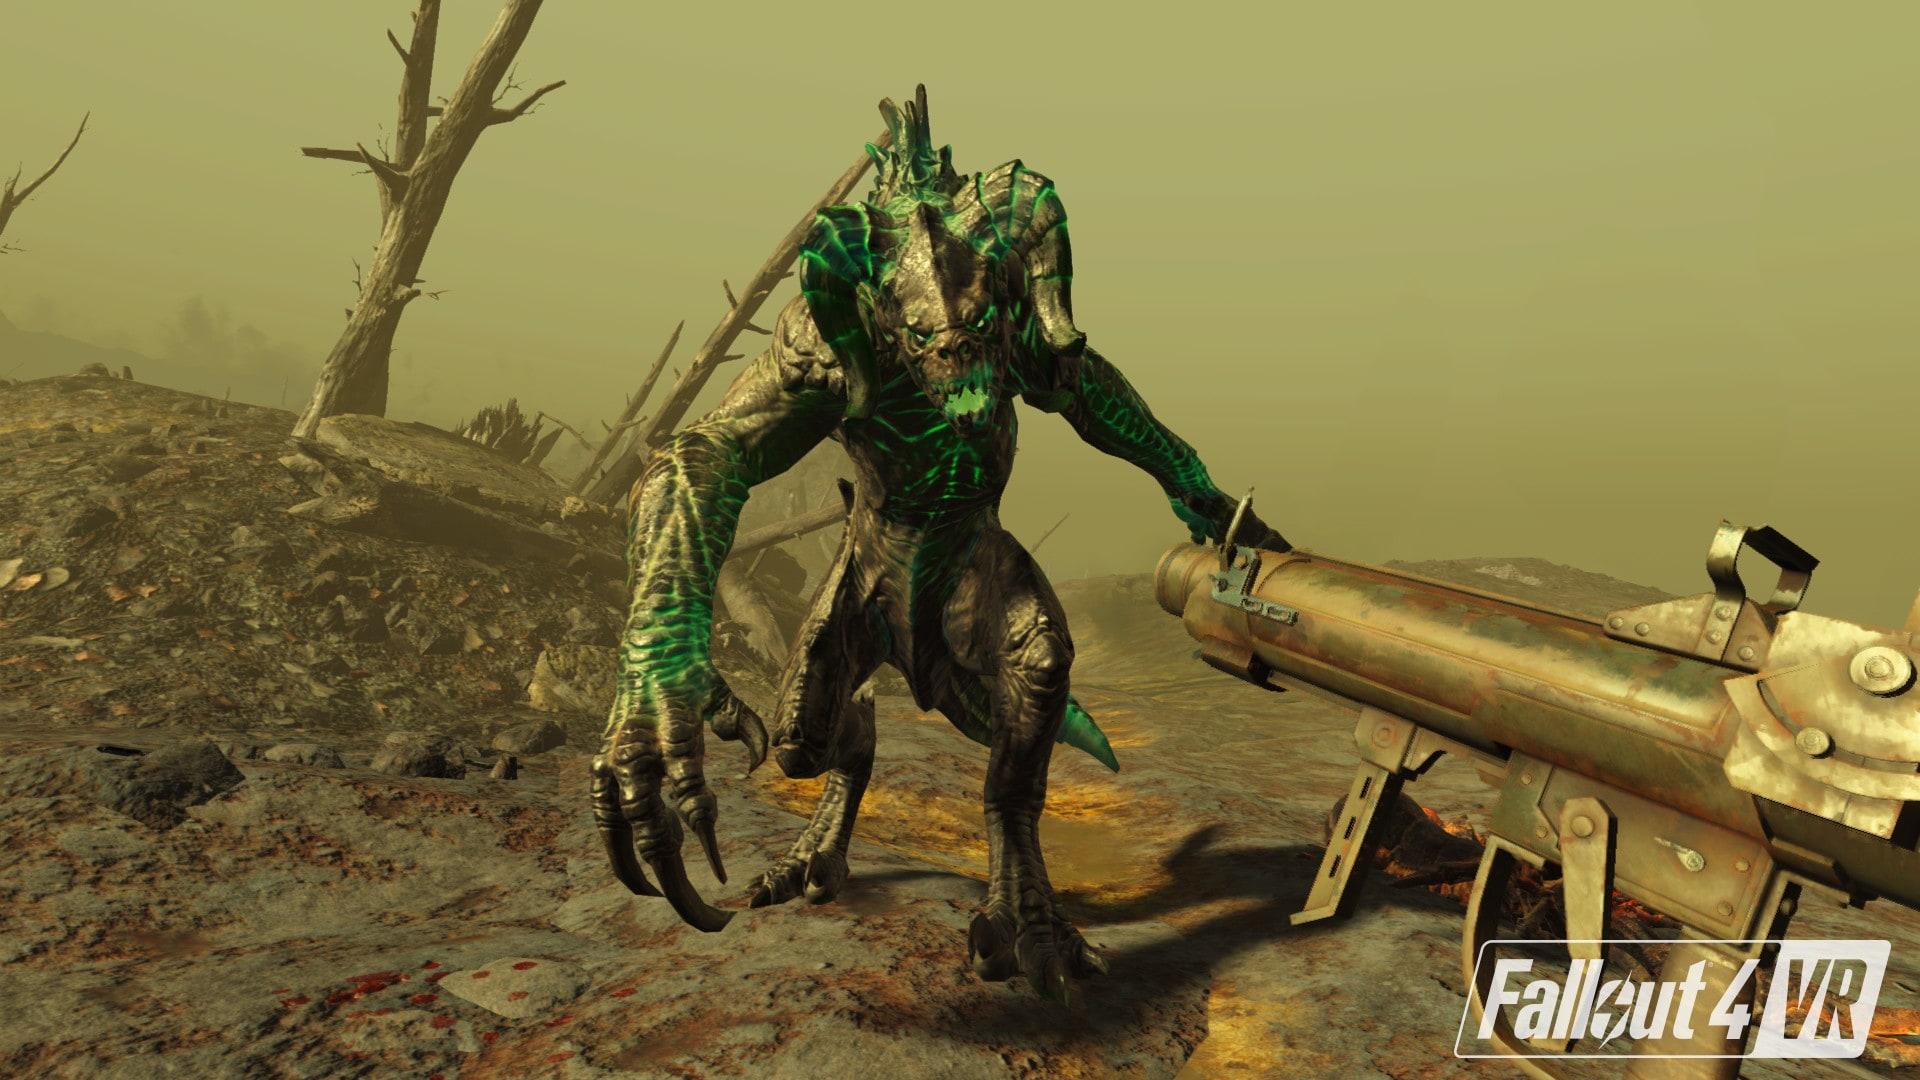 Fallout 4 VR (PC) - Steam Key - GLOBAL - 2